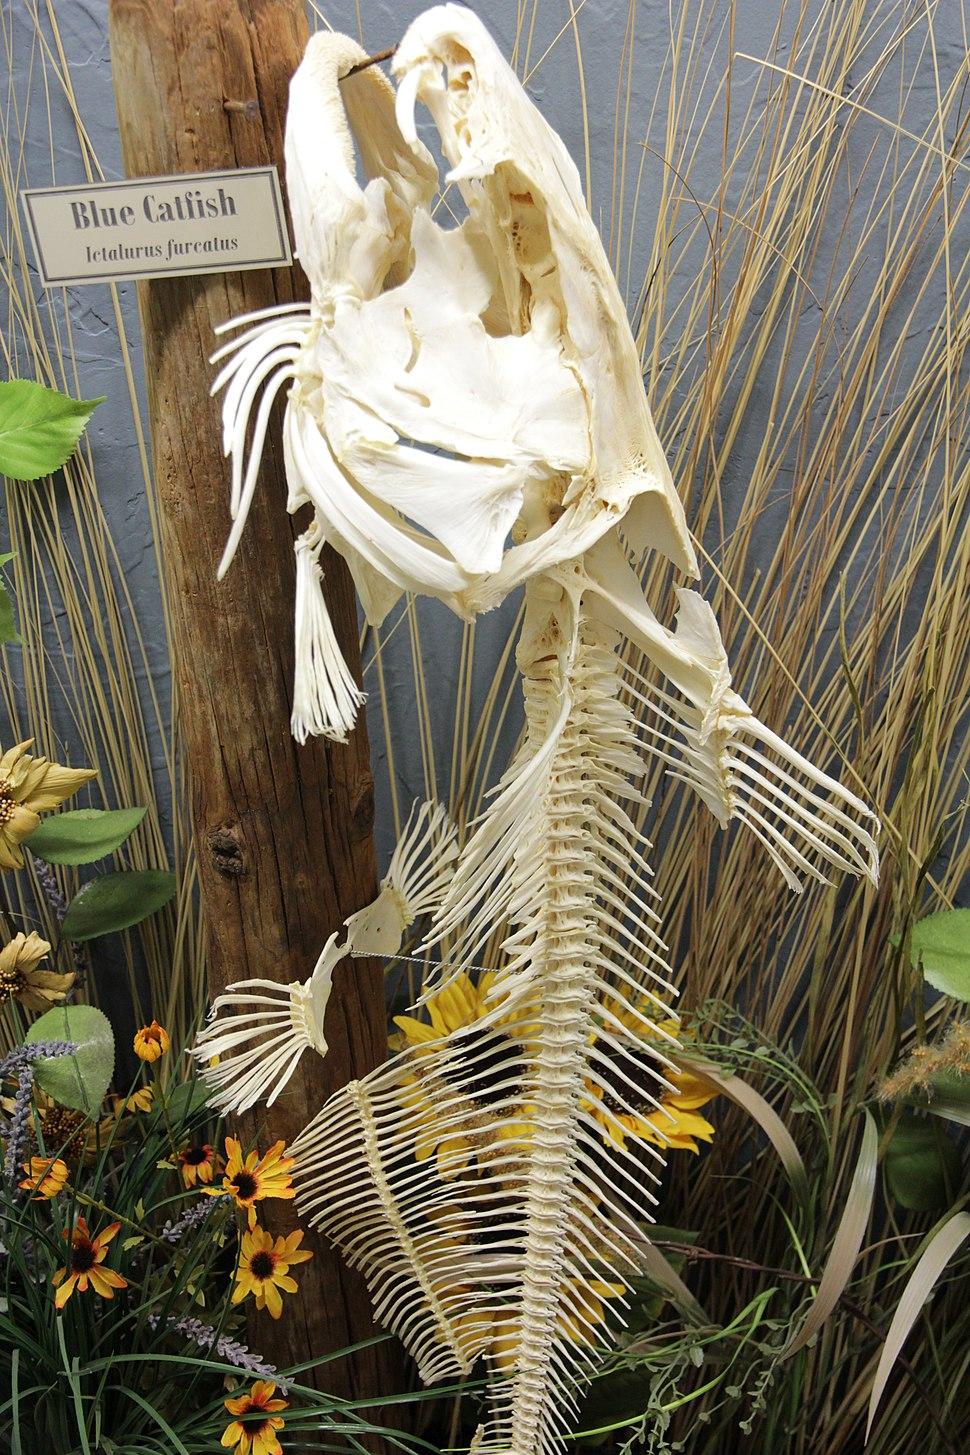 Blue catfish skeleton